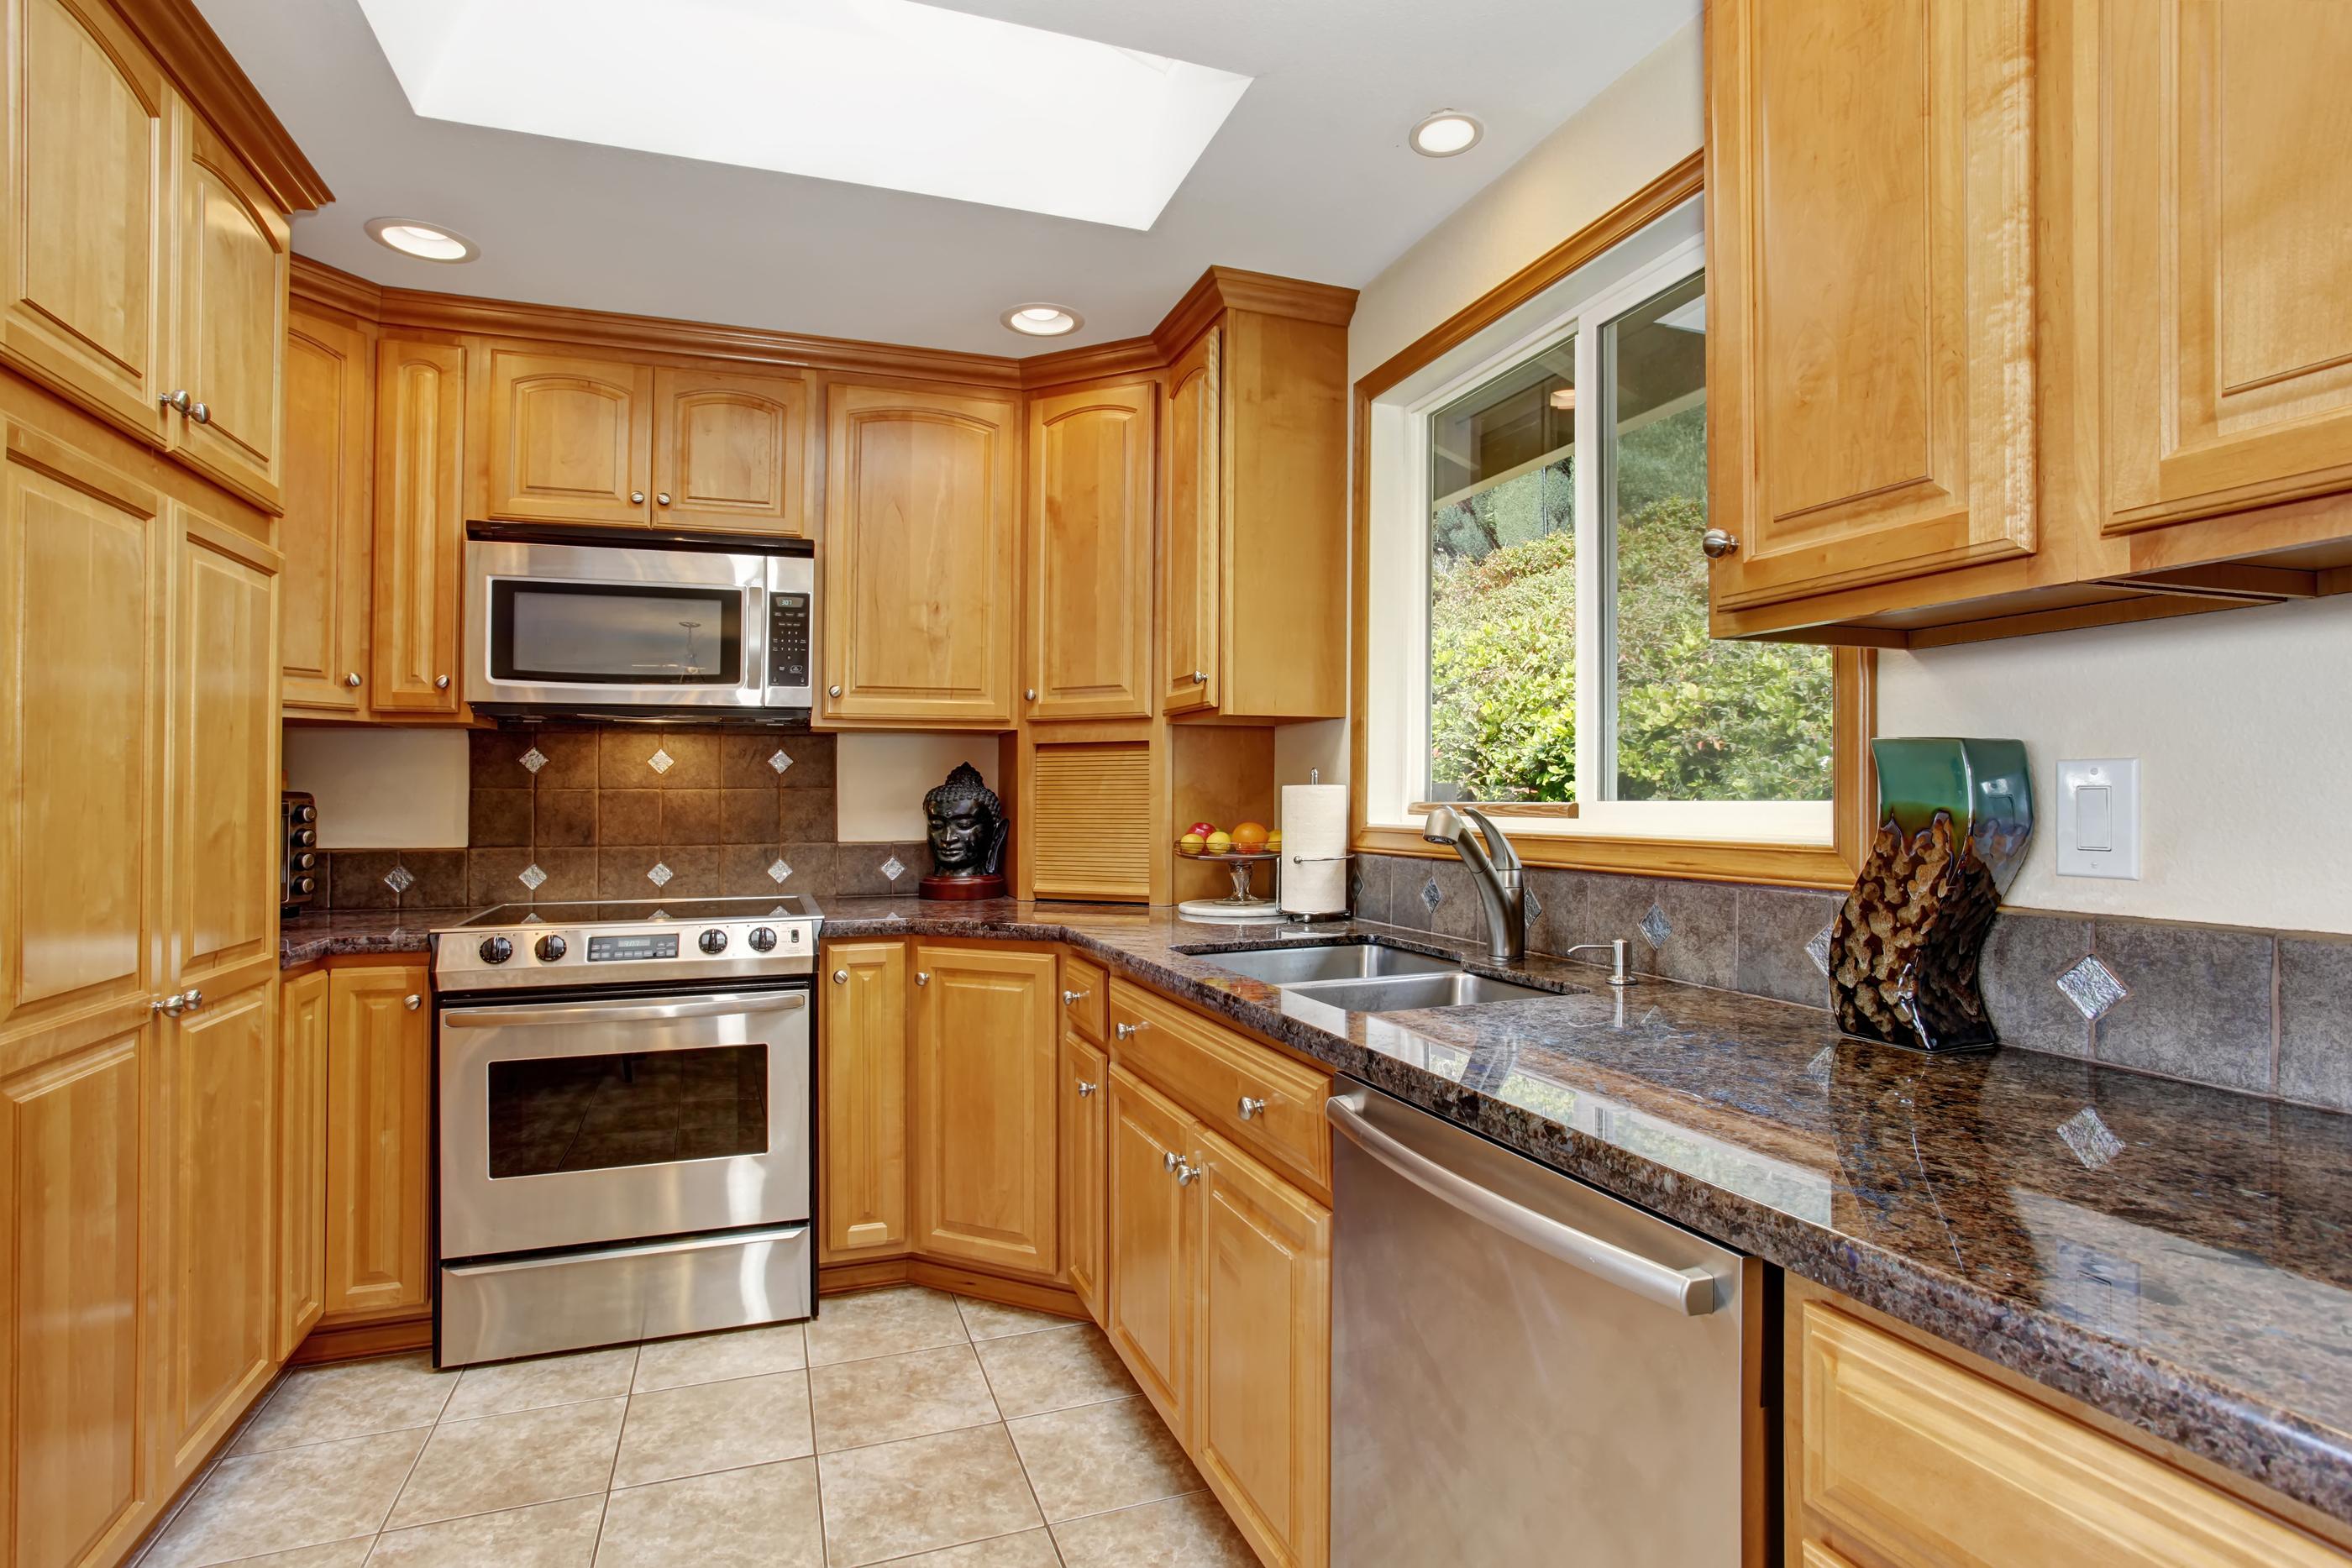 cabinetsplusremodeling kitchen remodeling rochester ny Cabinets Rochester NY